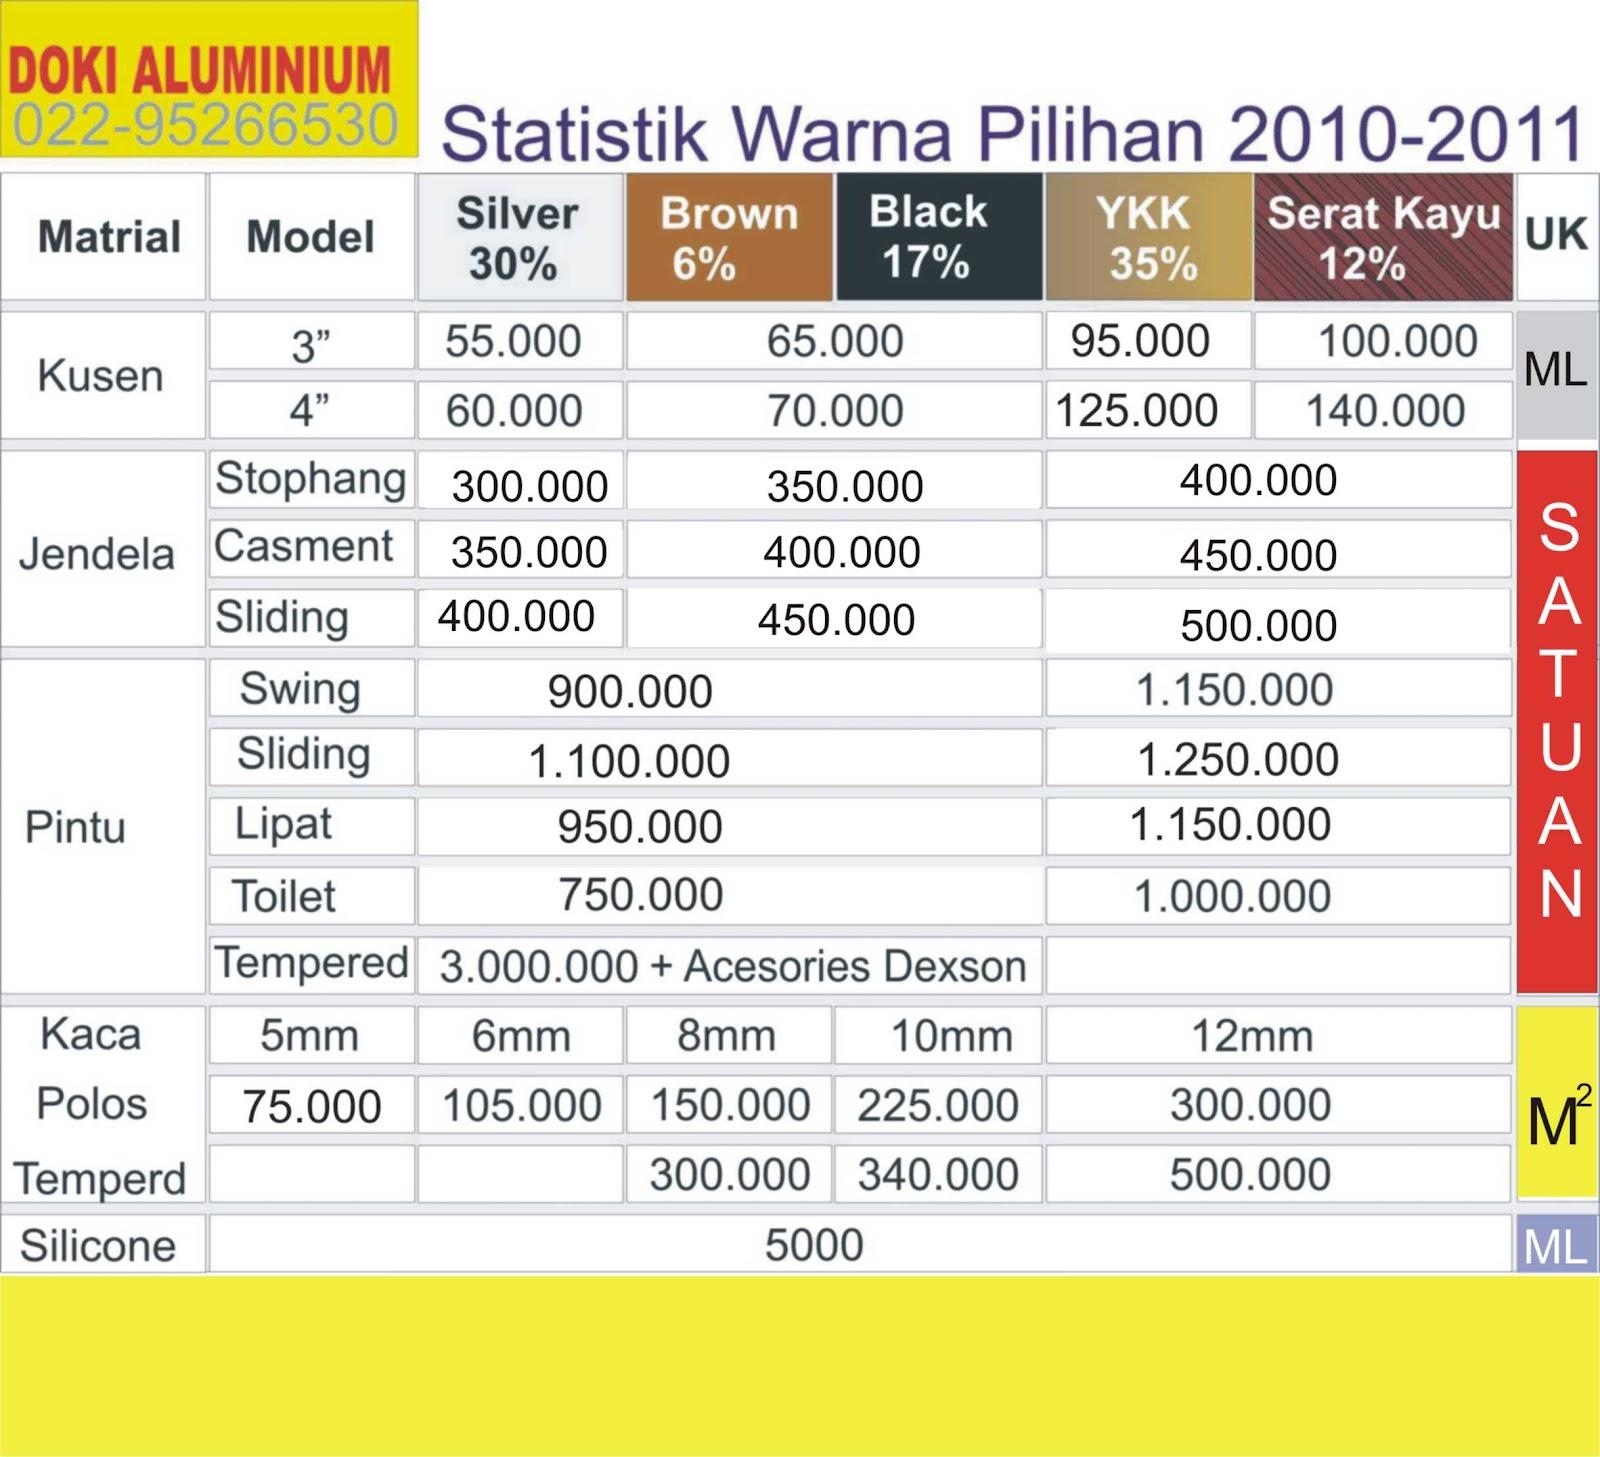 Aluminium KusenPintuJendela 03 26 12